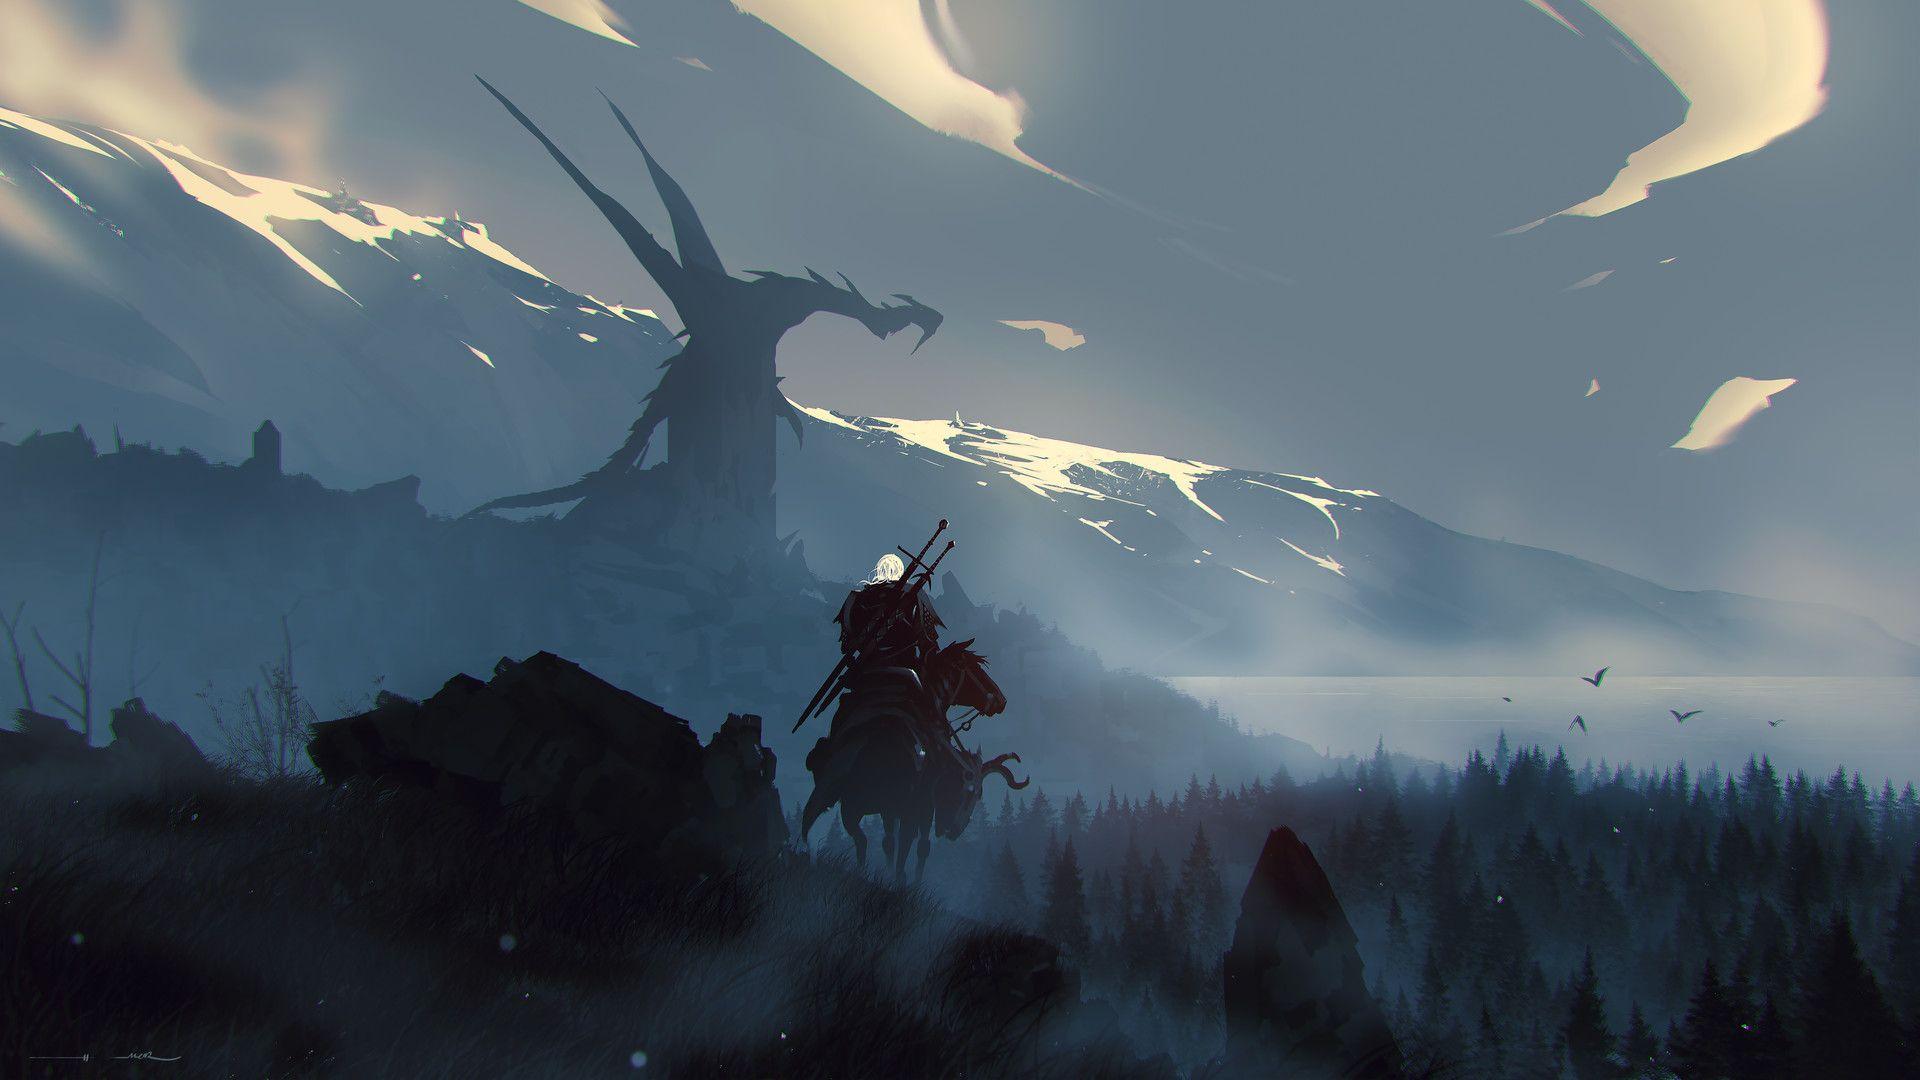 Geralt The Witcher (By ömer tunç)[1920×1080] Фэнтези